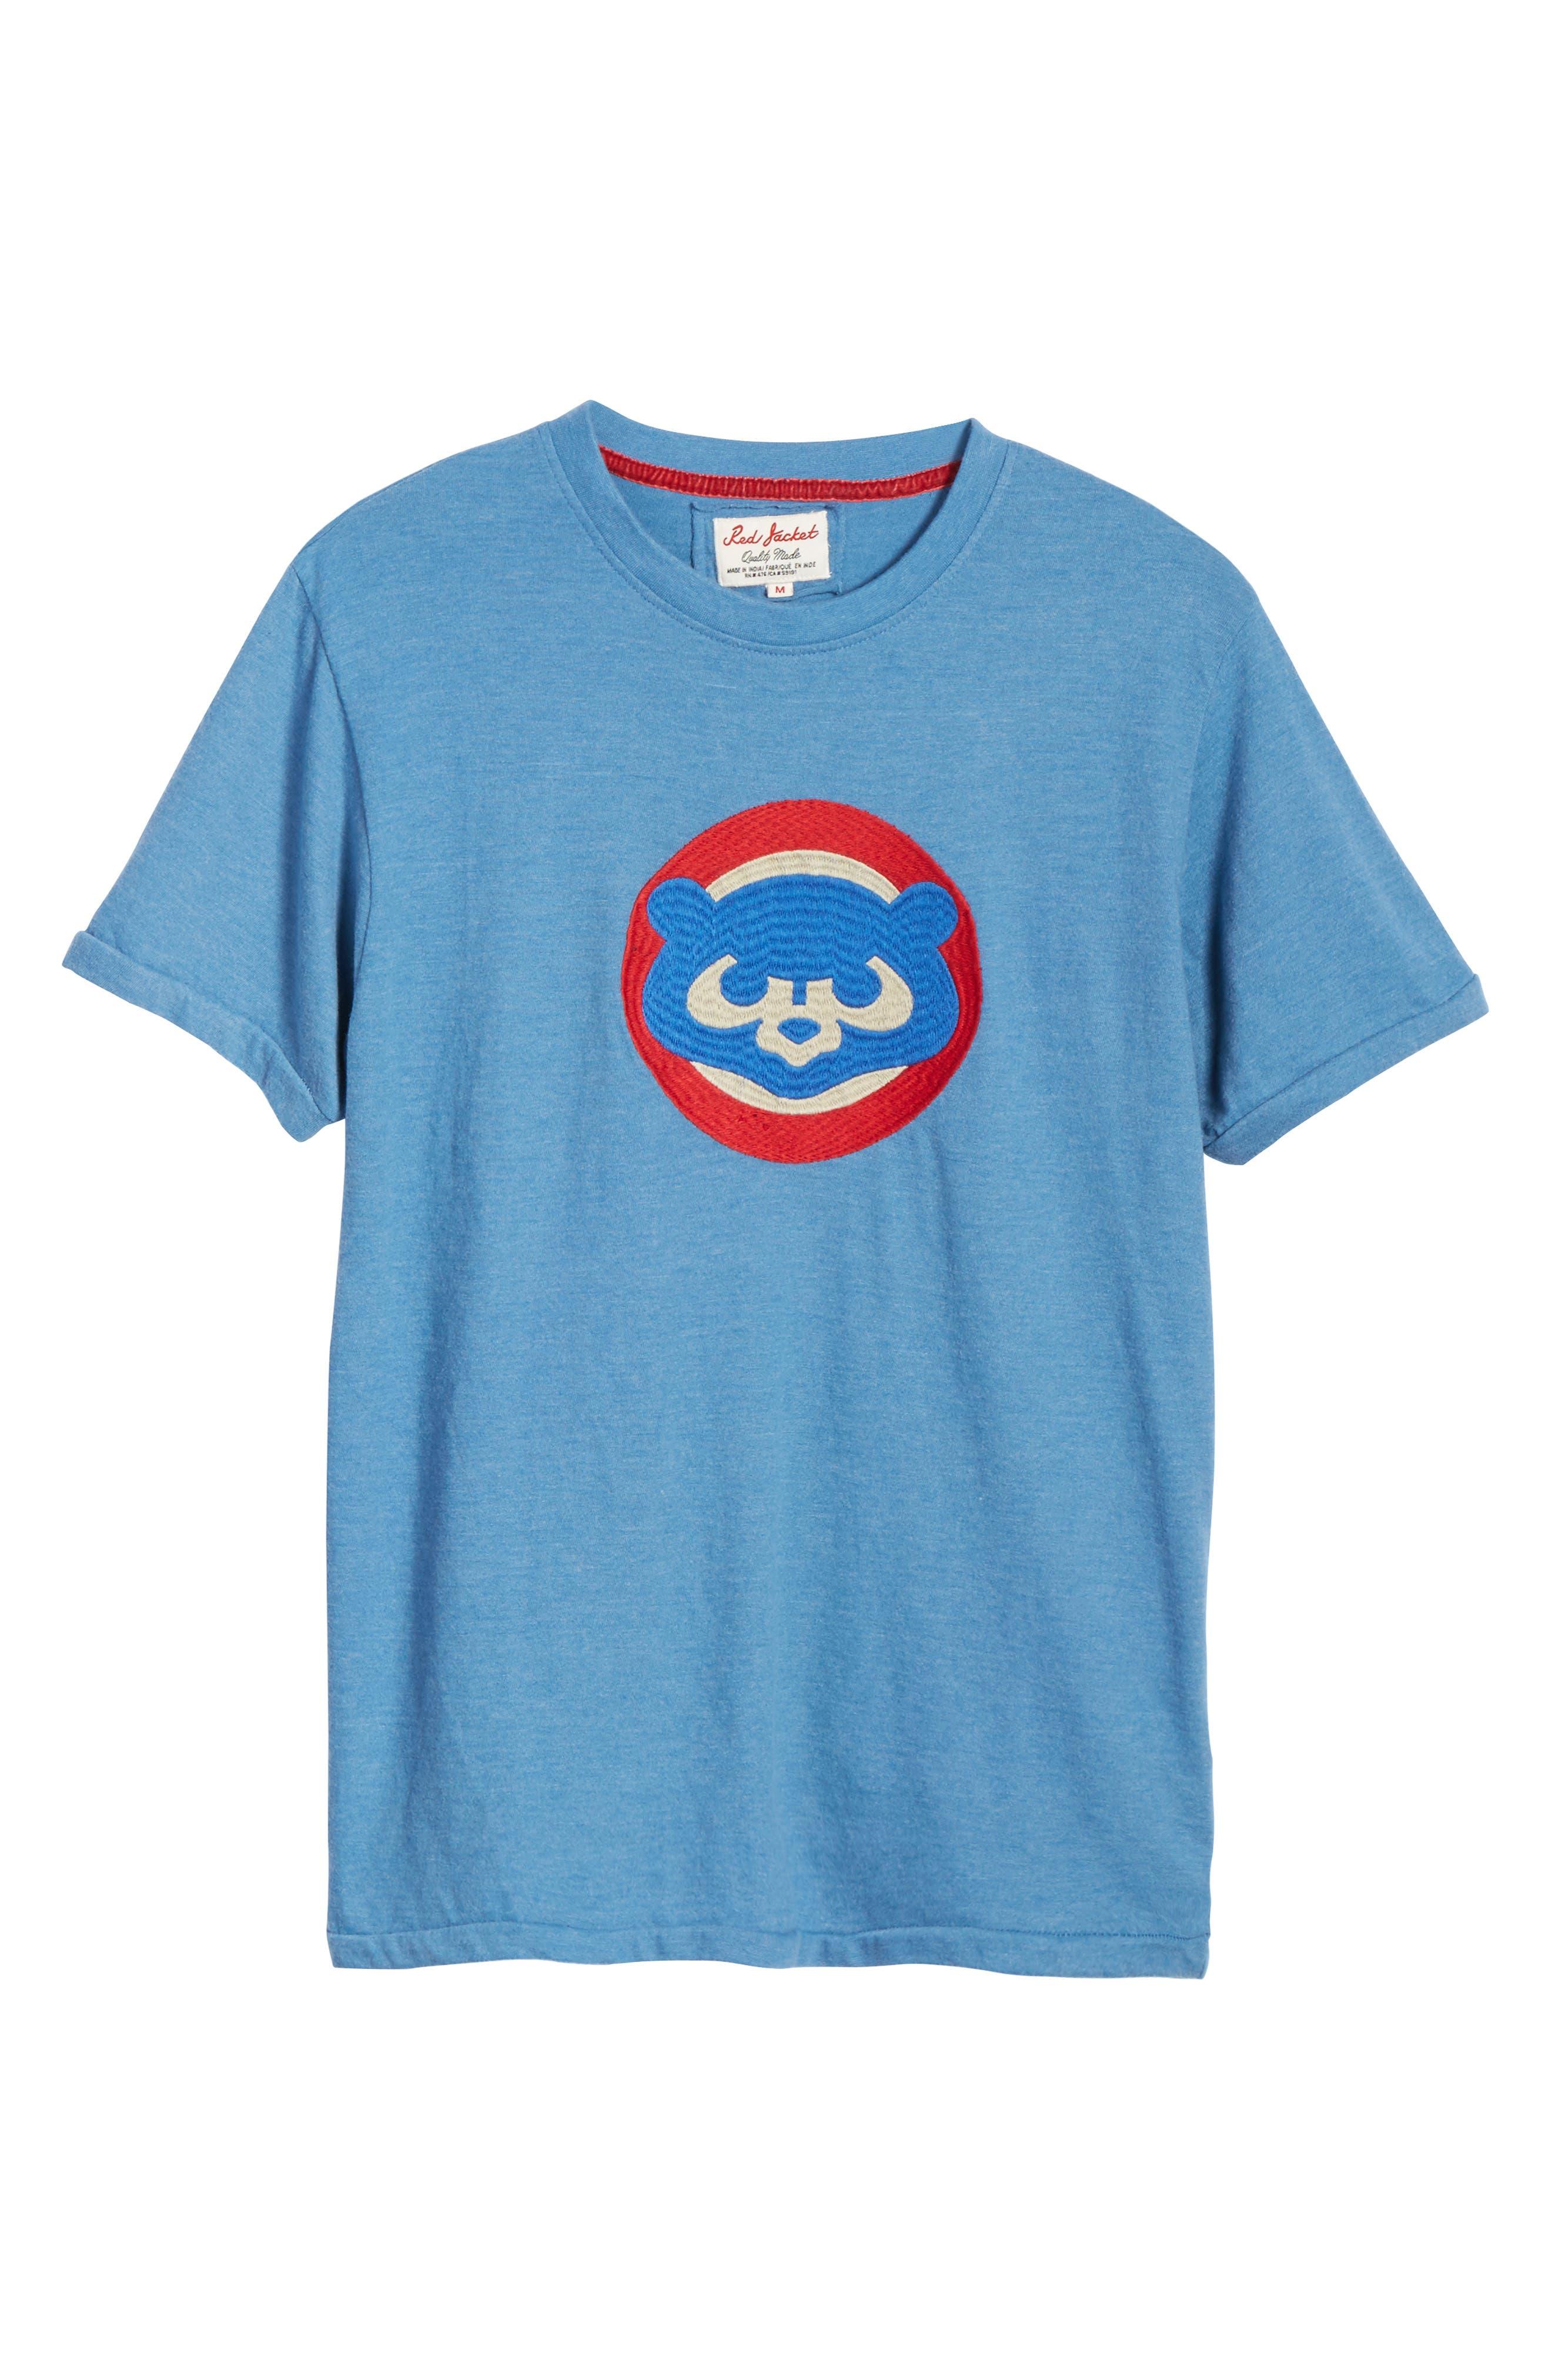 Hillwood Chicago Cubs T-Shirt,                             Alternate thumbnail 6, color,                             450